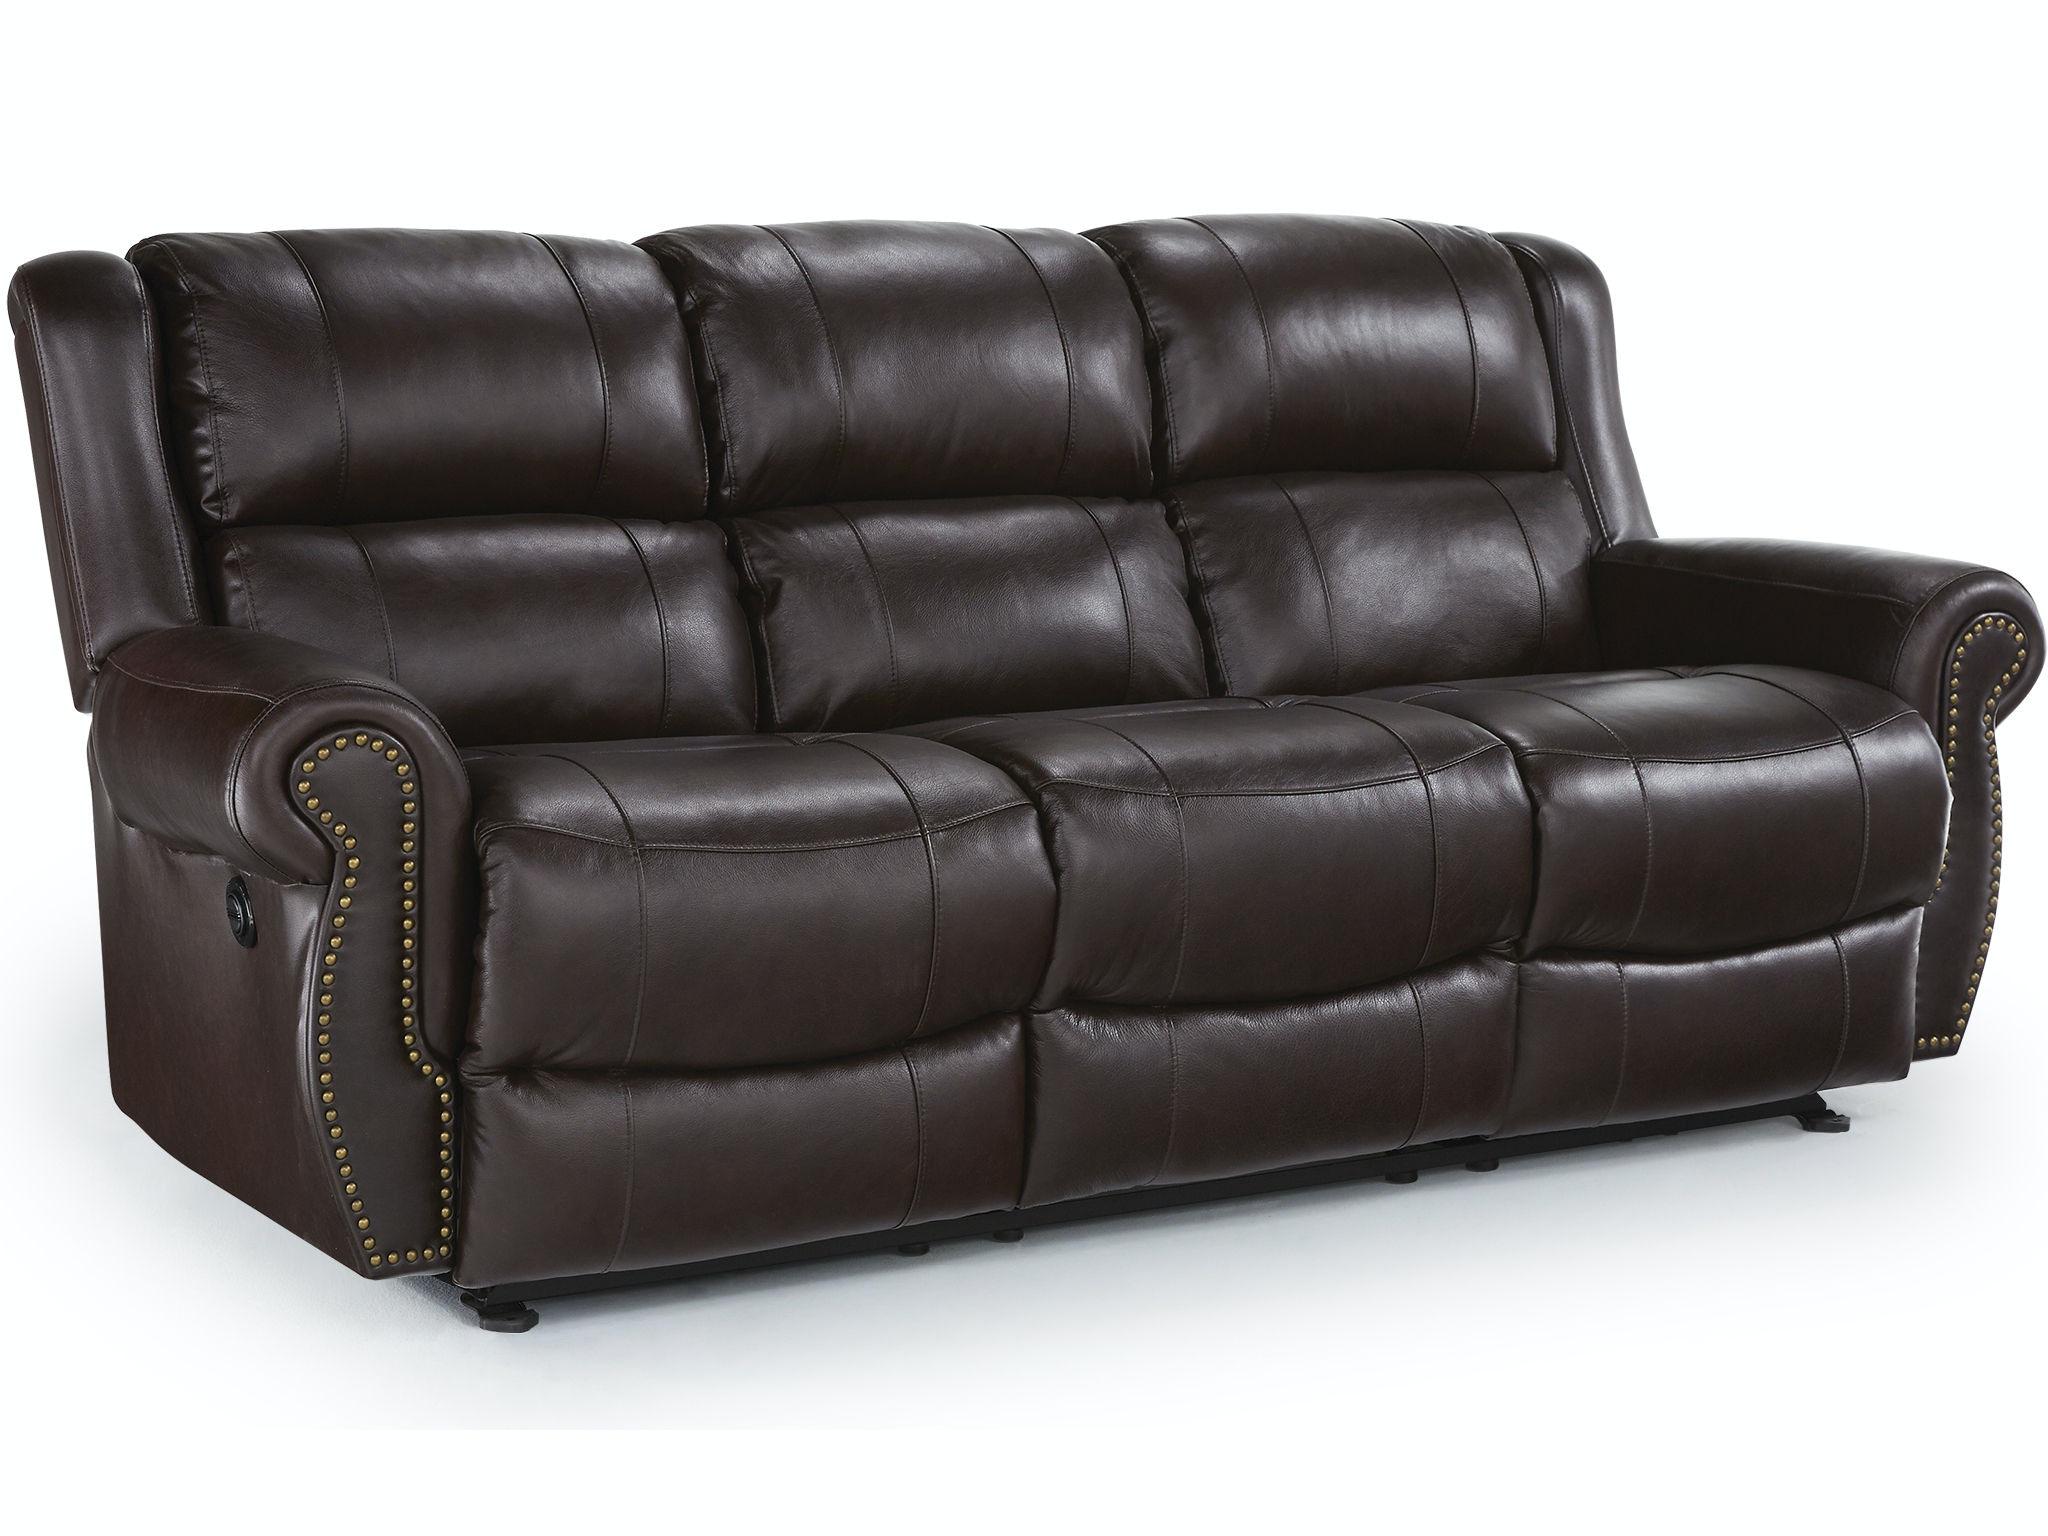 Best Home Furnishings Living Room Sofa